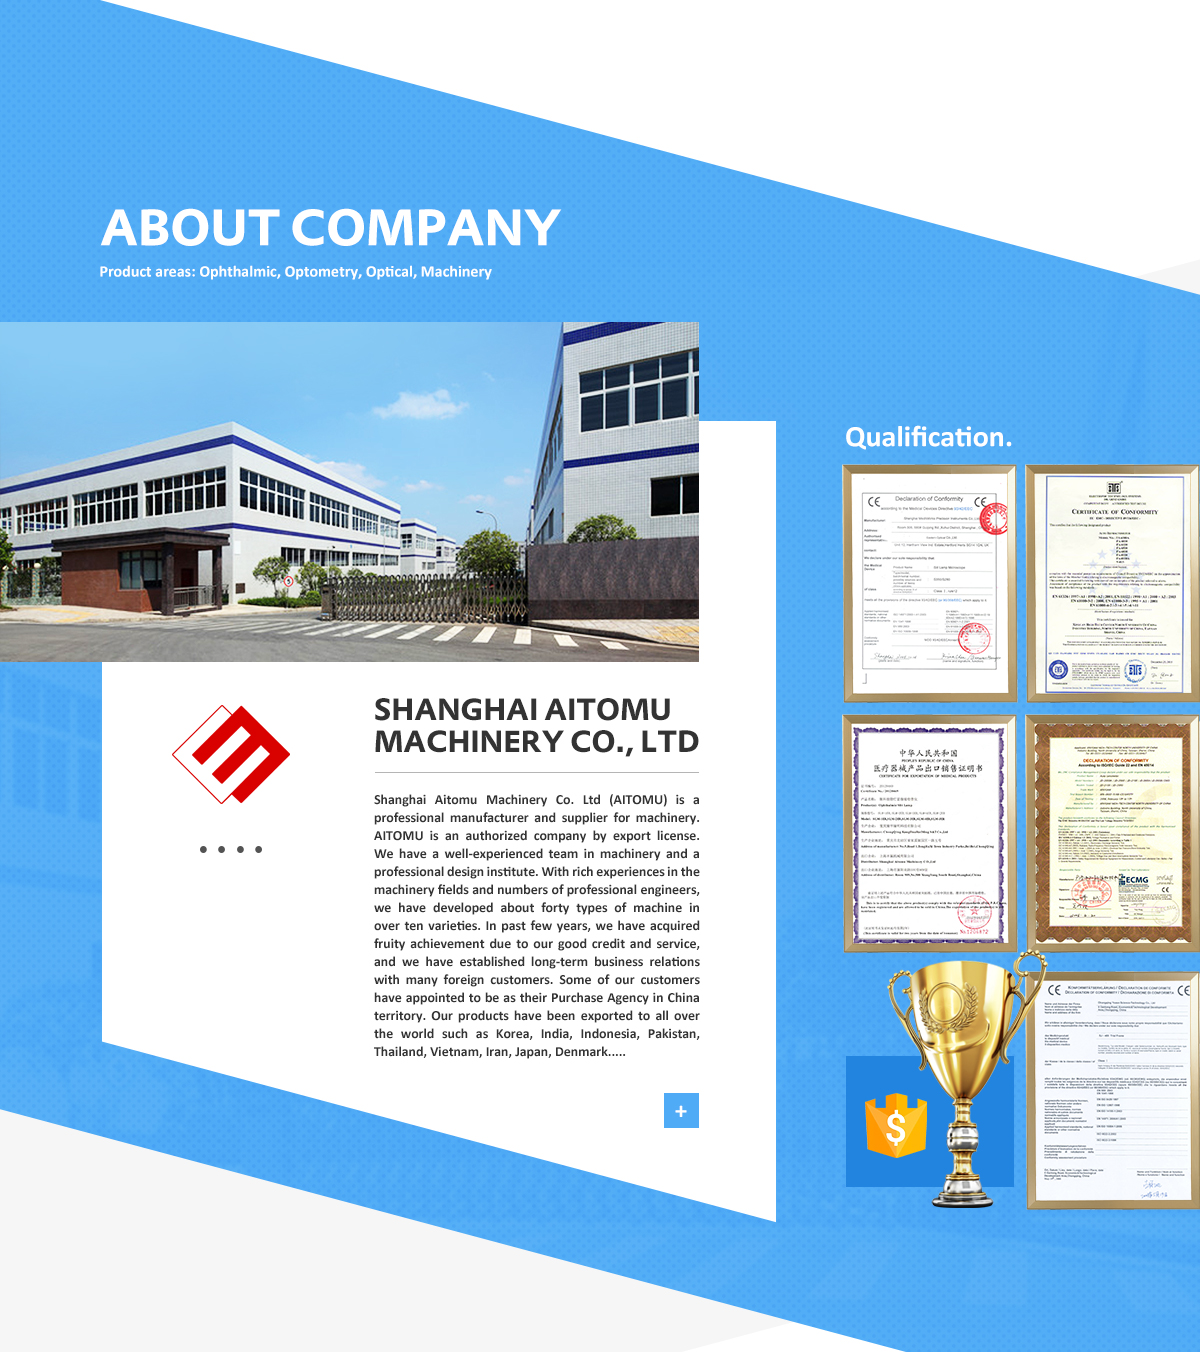 Shanghai Aitomu Machinery Co , Ltd  - Ophthalmic Equipment, Auto